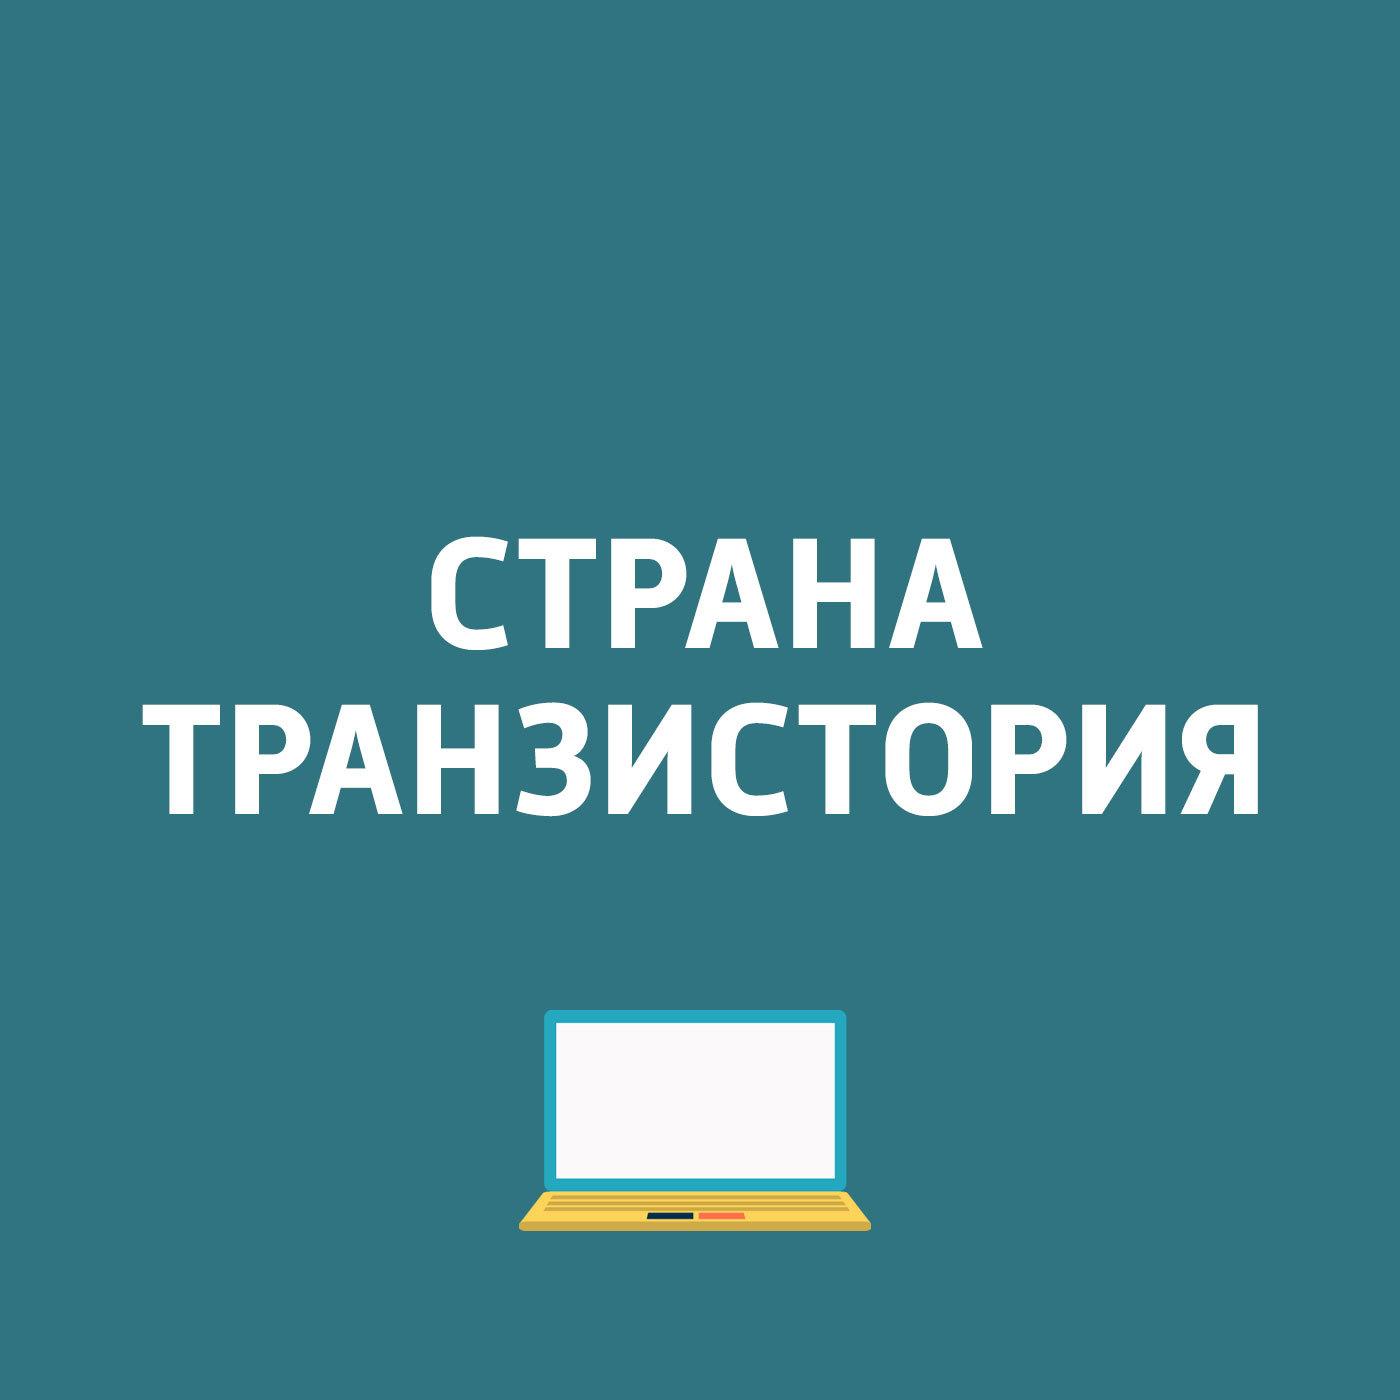 Картаев Павел Sony Xperia XZ Premium; Aerocool - P7-C1... fandyfire p7 d ssc p7 d 1 mode 700 lumen white led flashlight with strap 1 x 18650 1 x 17670